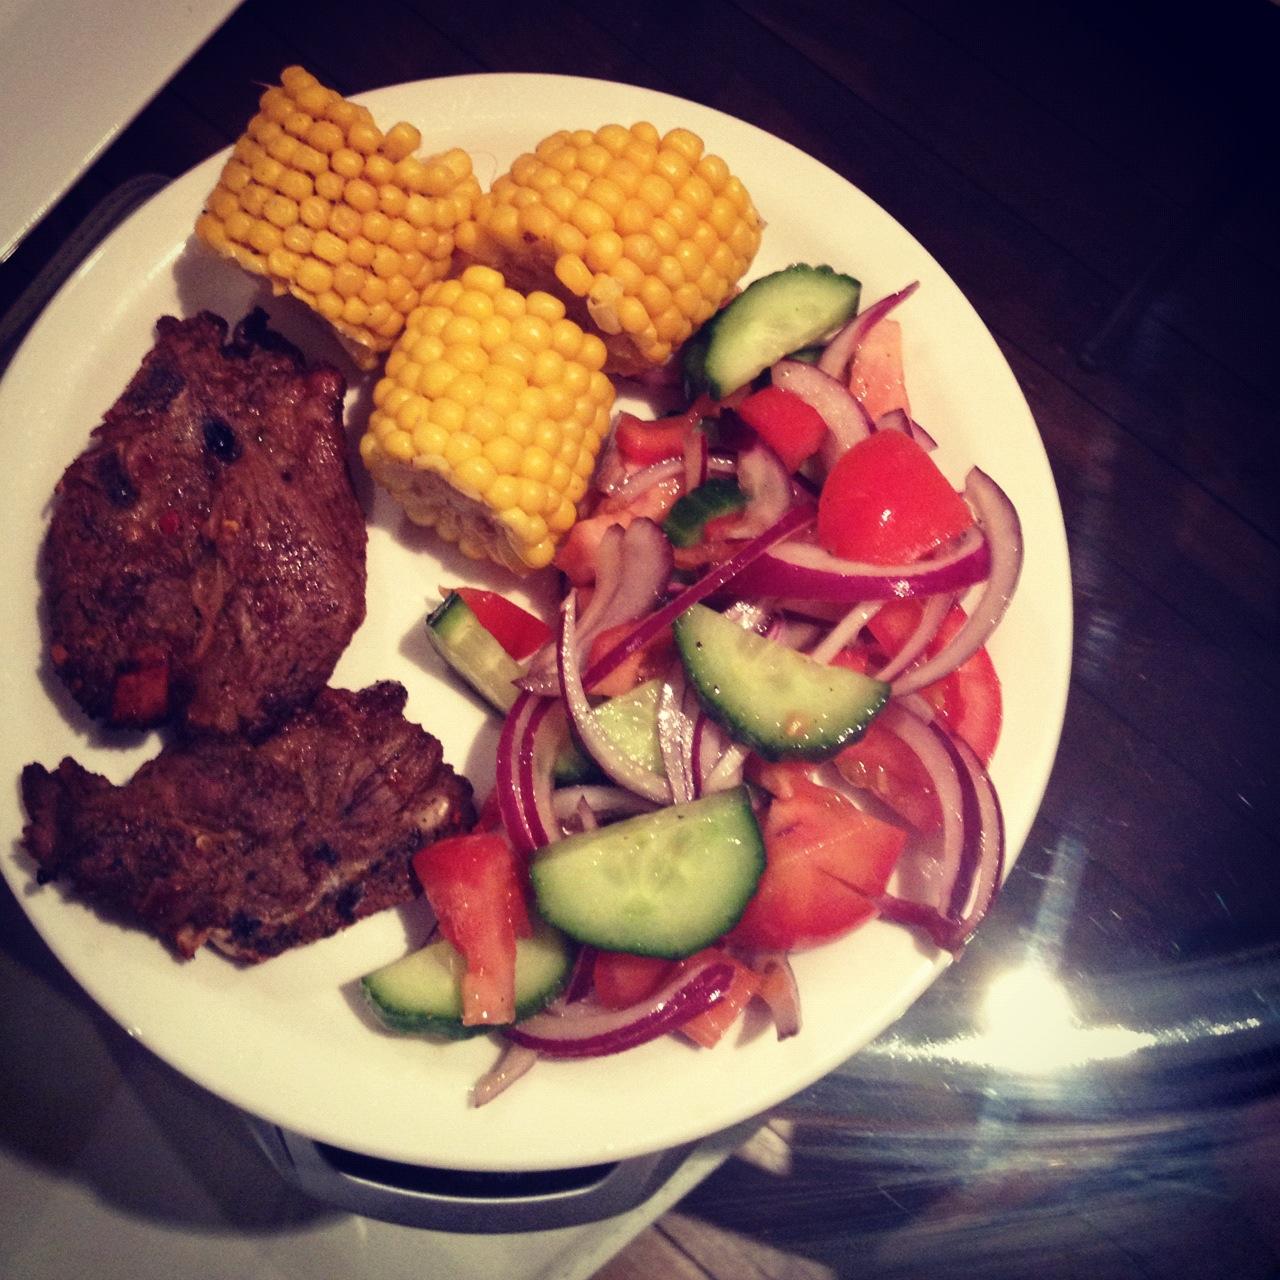 CSIRO Meat diet plan